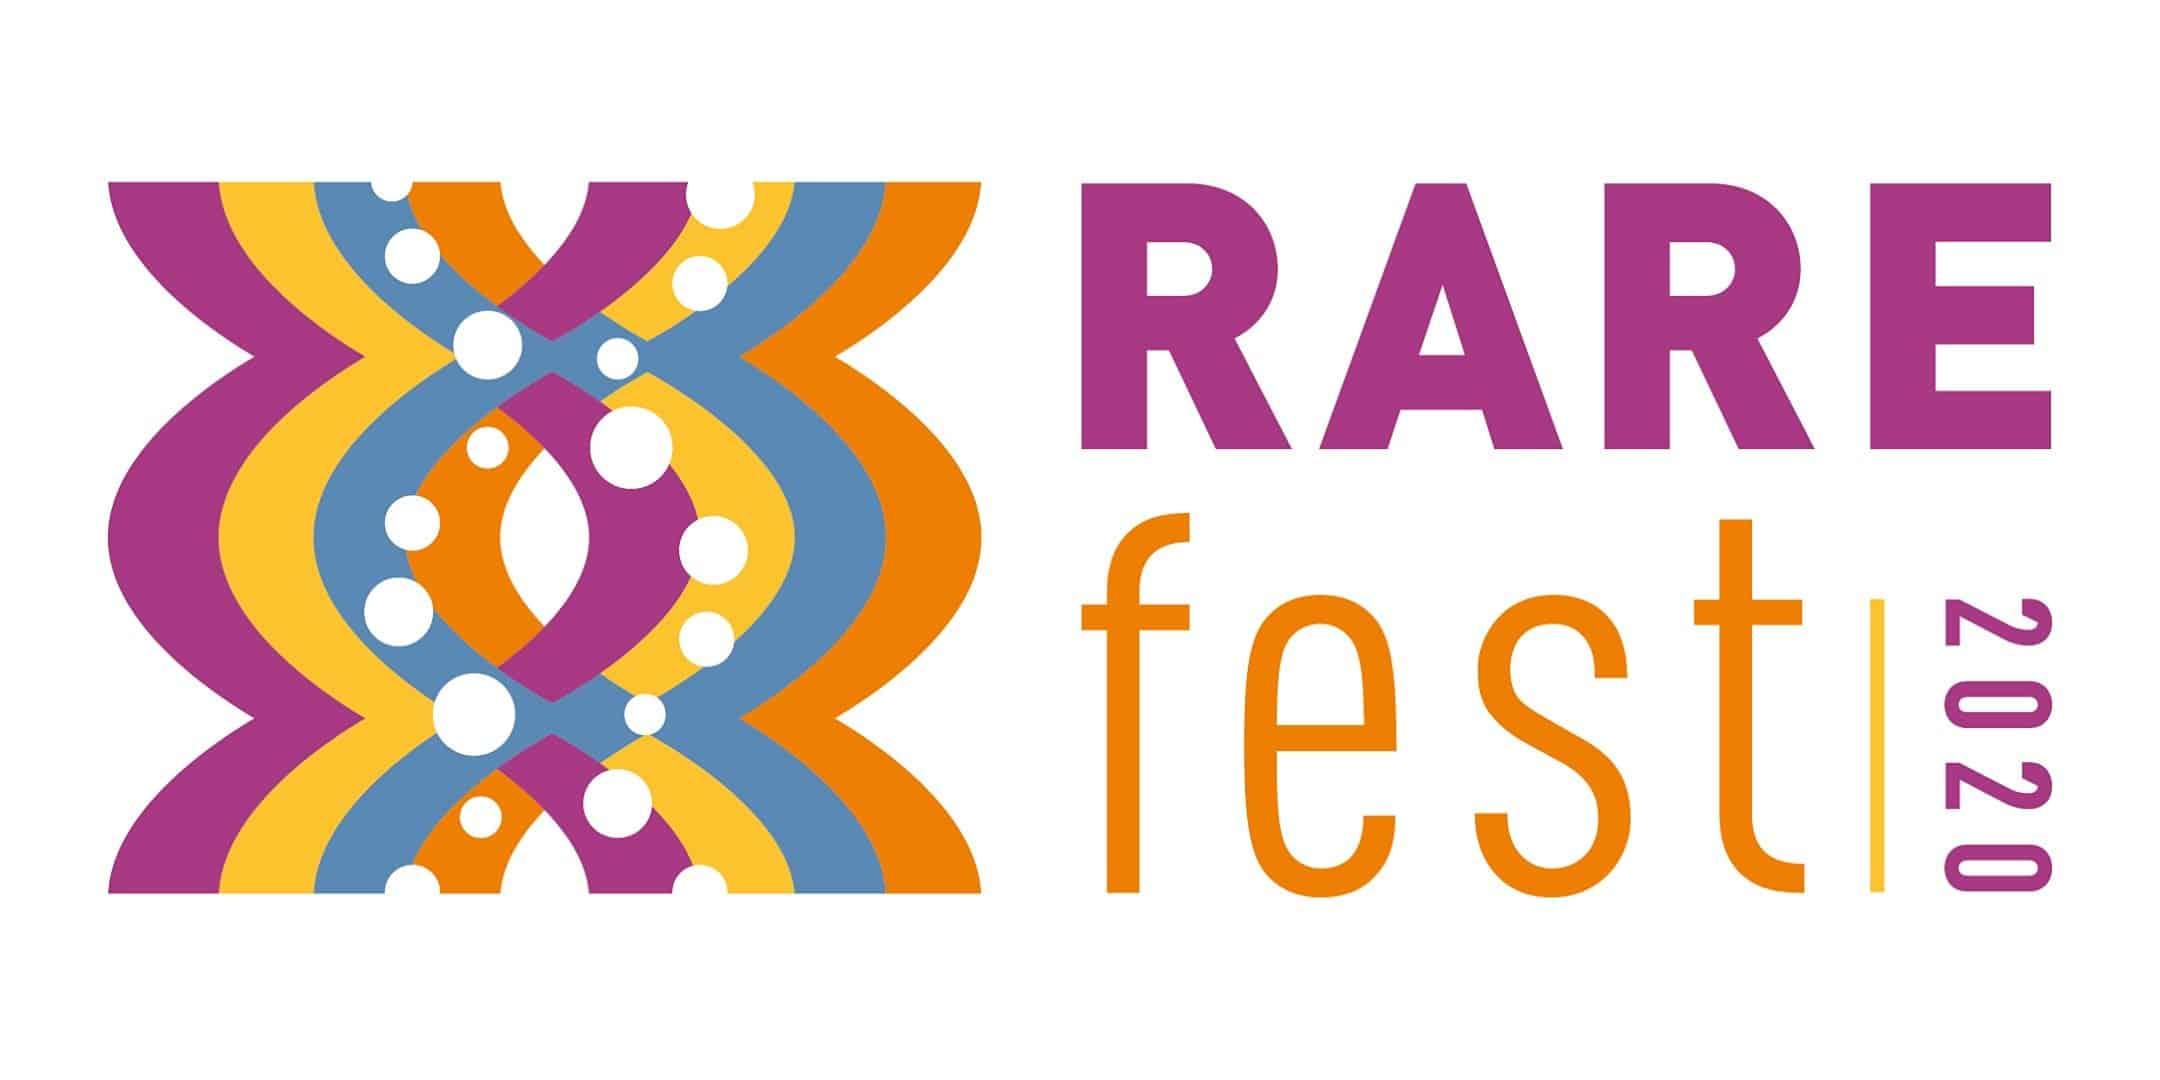 RAREfest20 science, technology and arts festival logo Cambridge Rare Disease Network